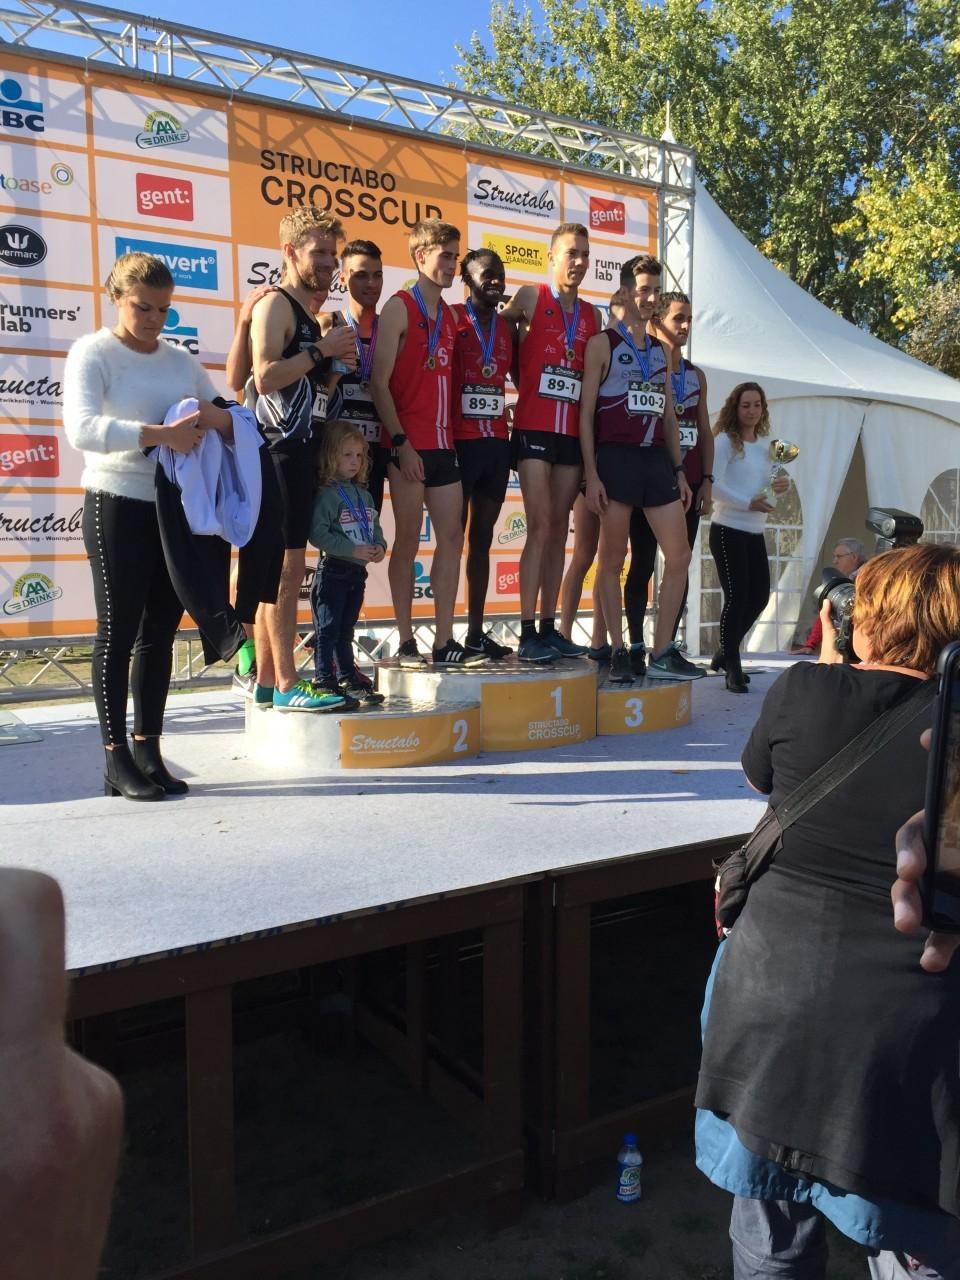 20181021_CC Relays podium mannen